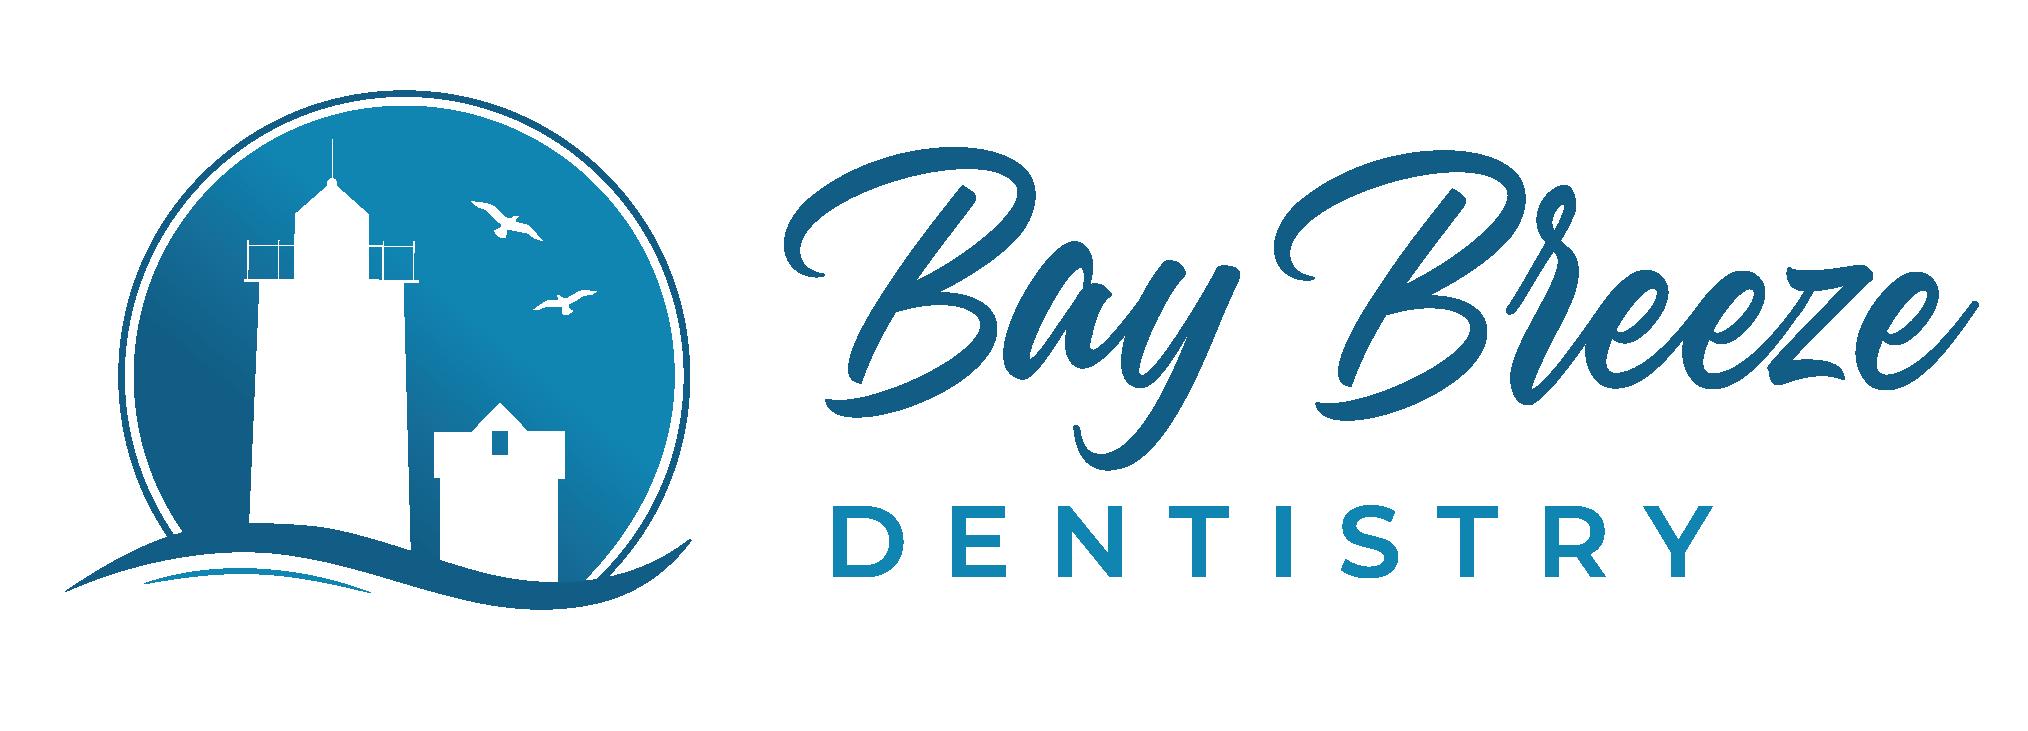 Bay Breeze Dentistry Mobile Logo